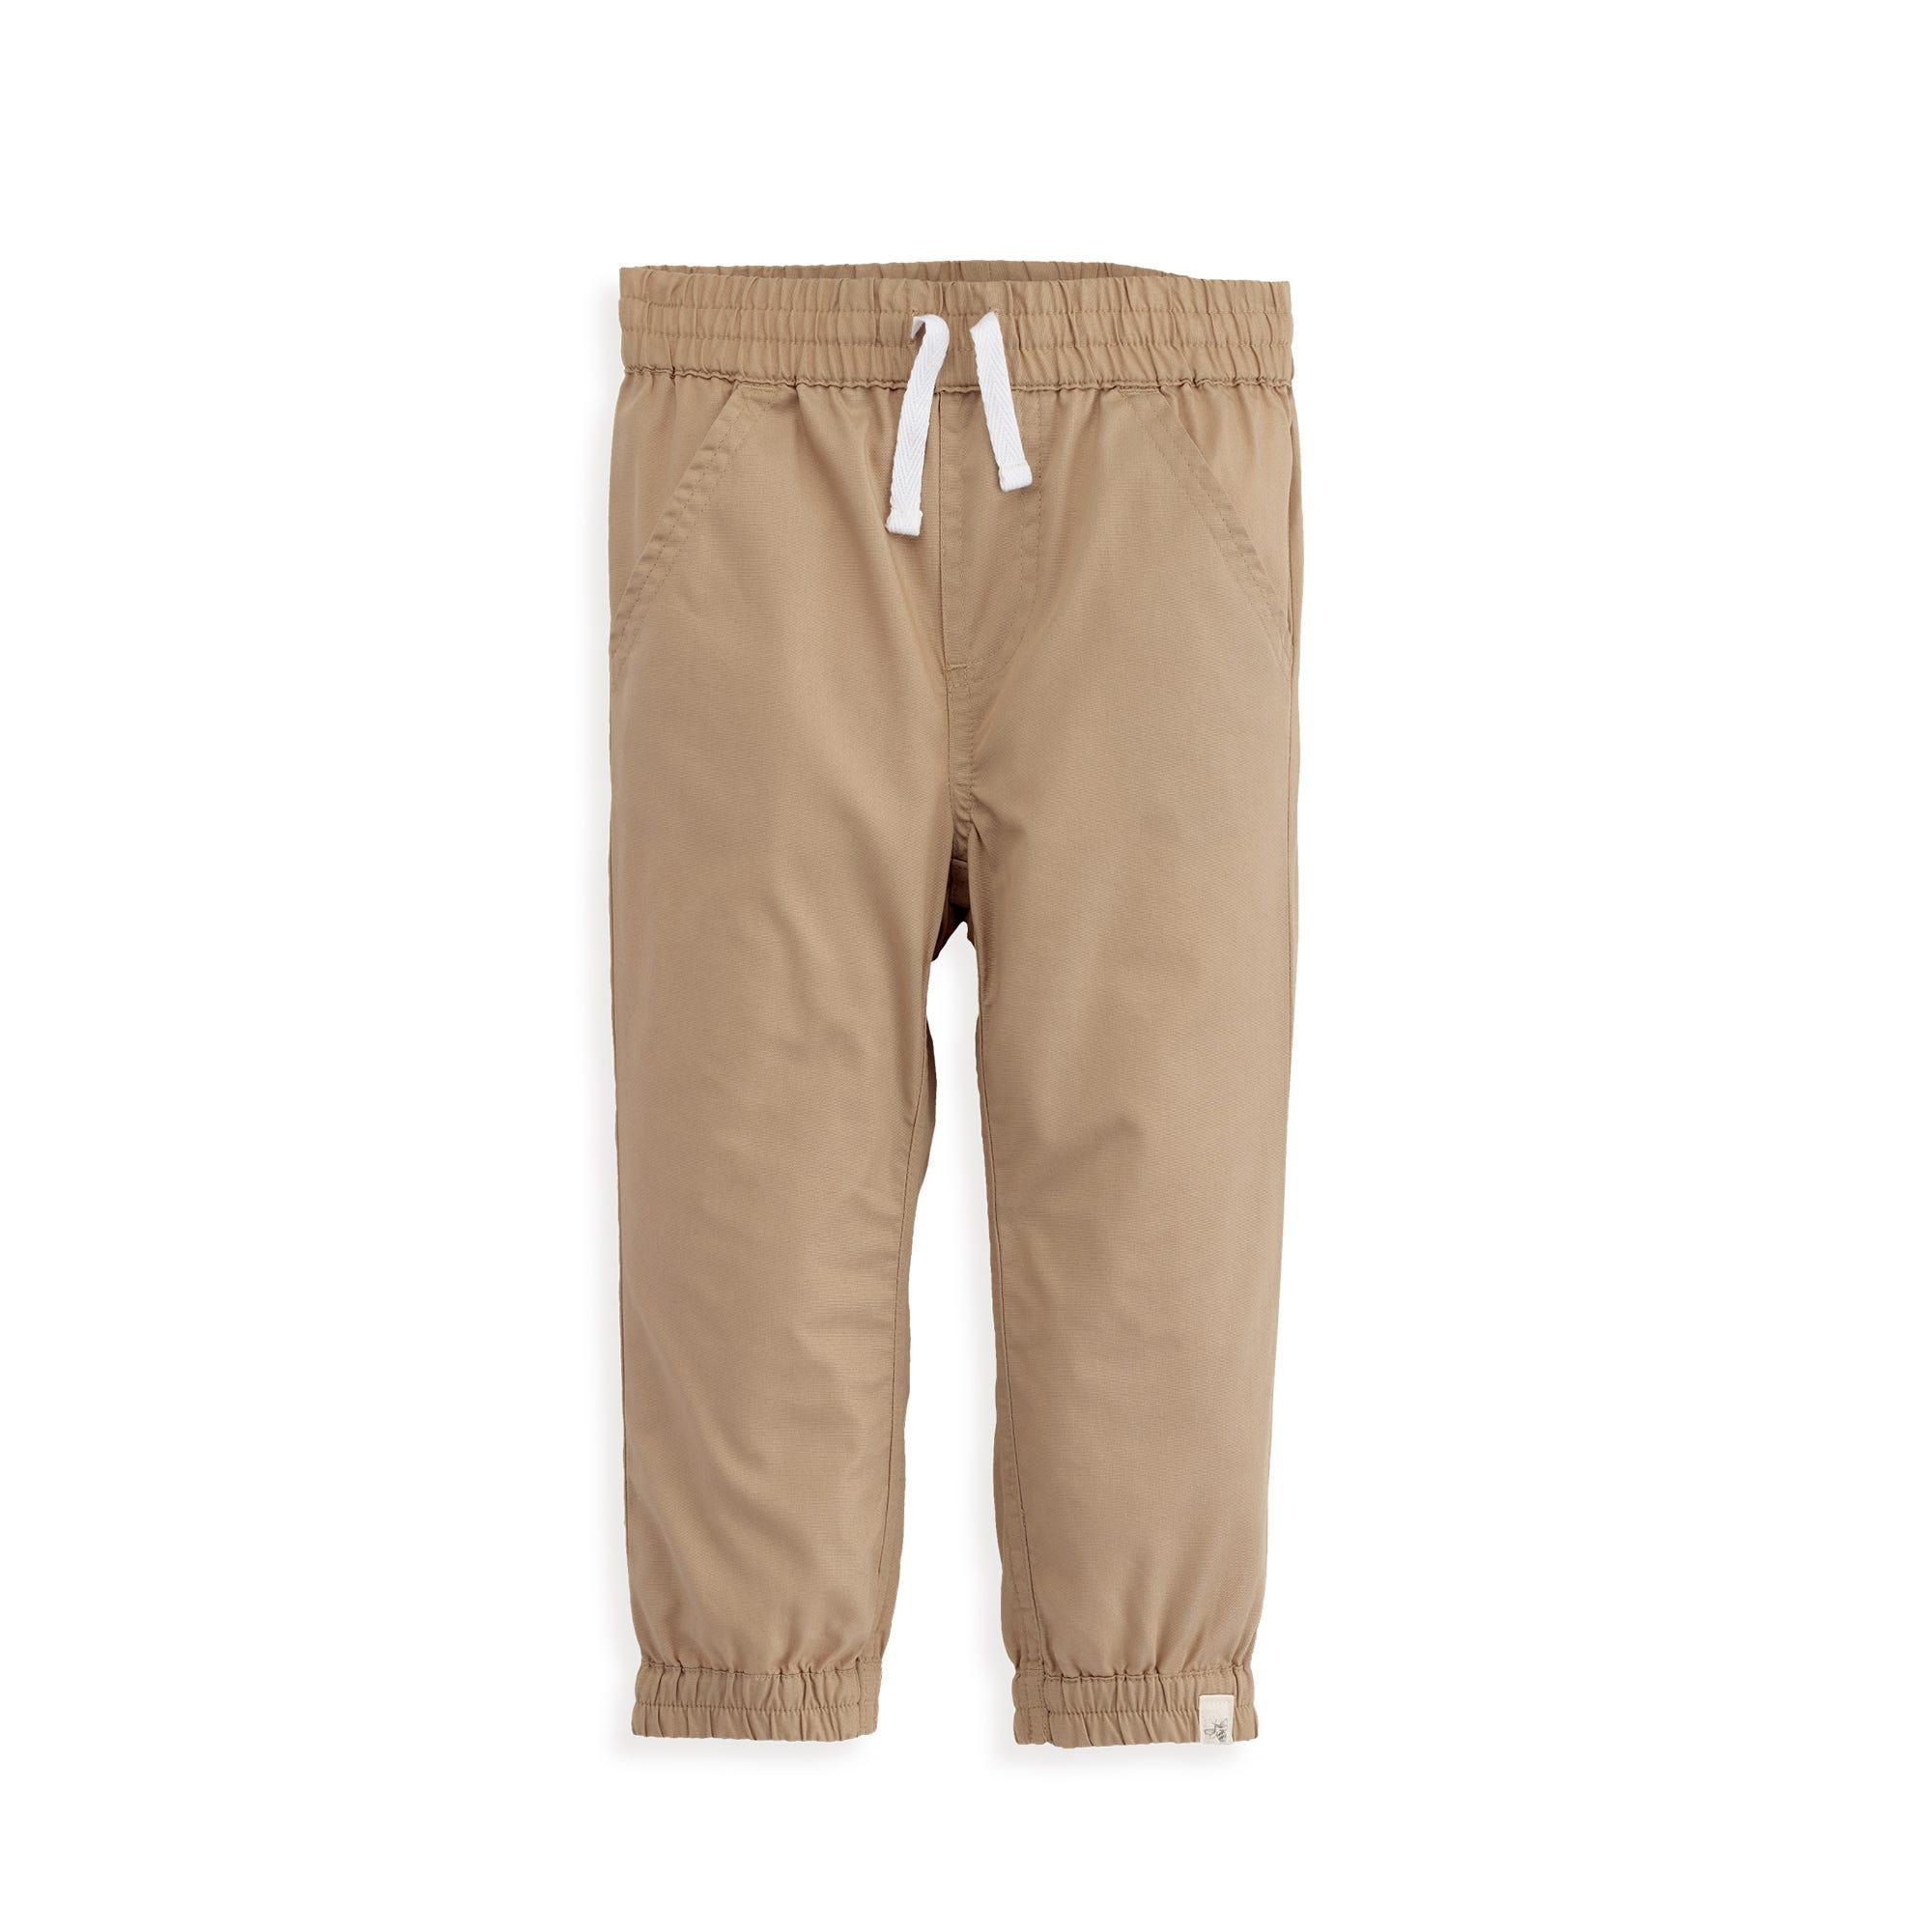 NEW Burts Baby Bees Poplin Gingham Shirt//Poplin Jogger Pant Set Sizes 3T,4T,5Y